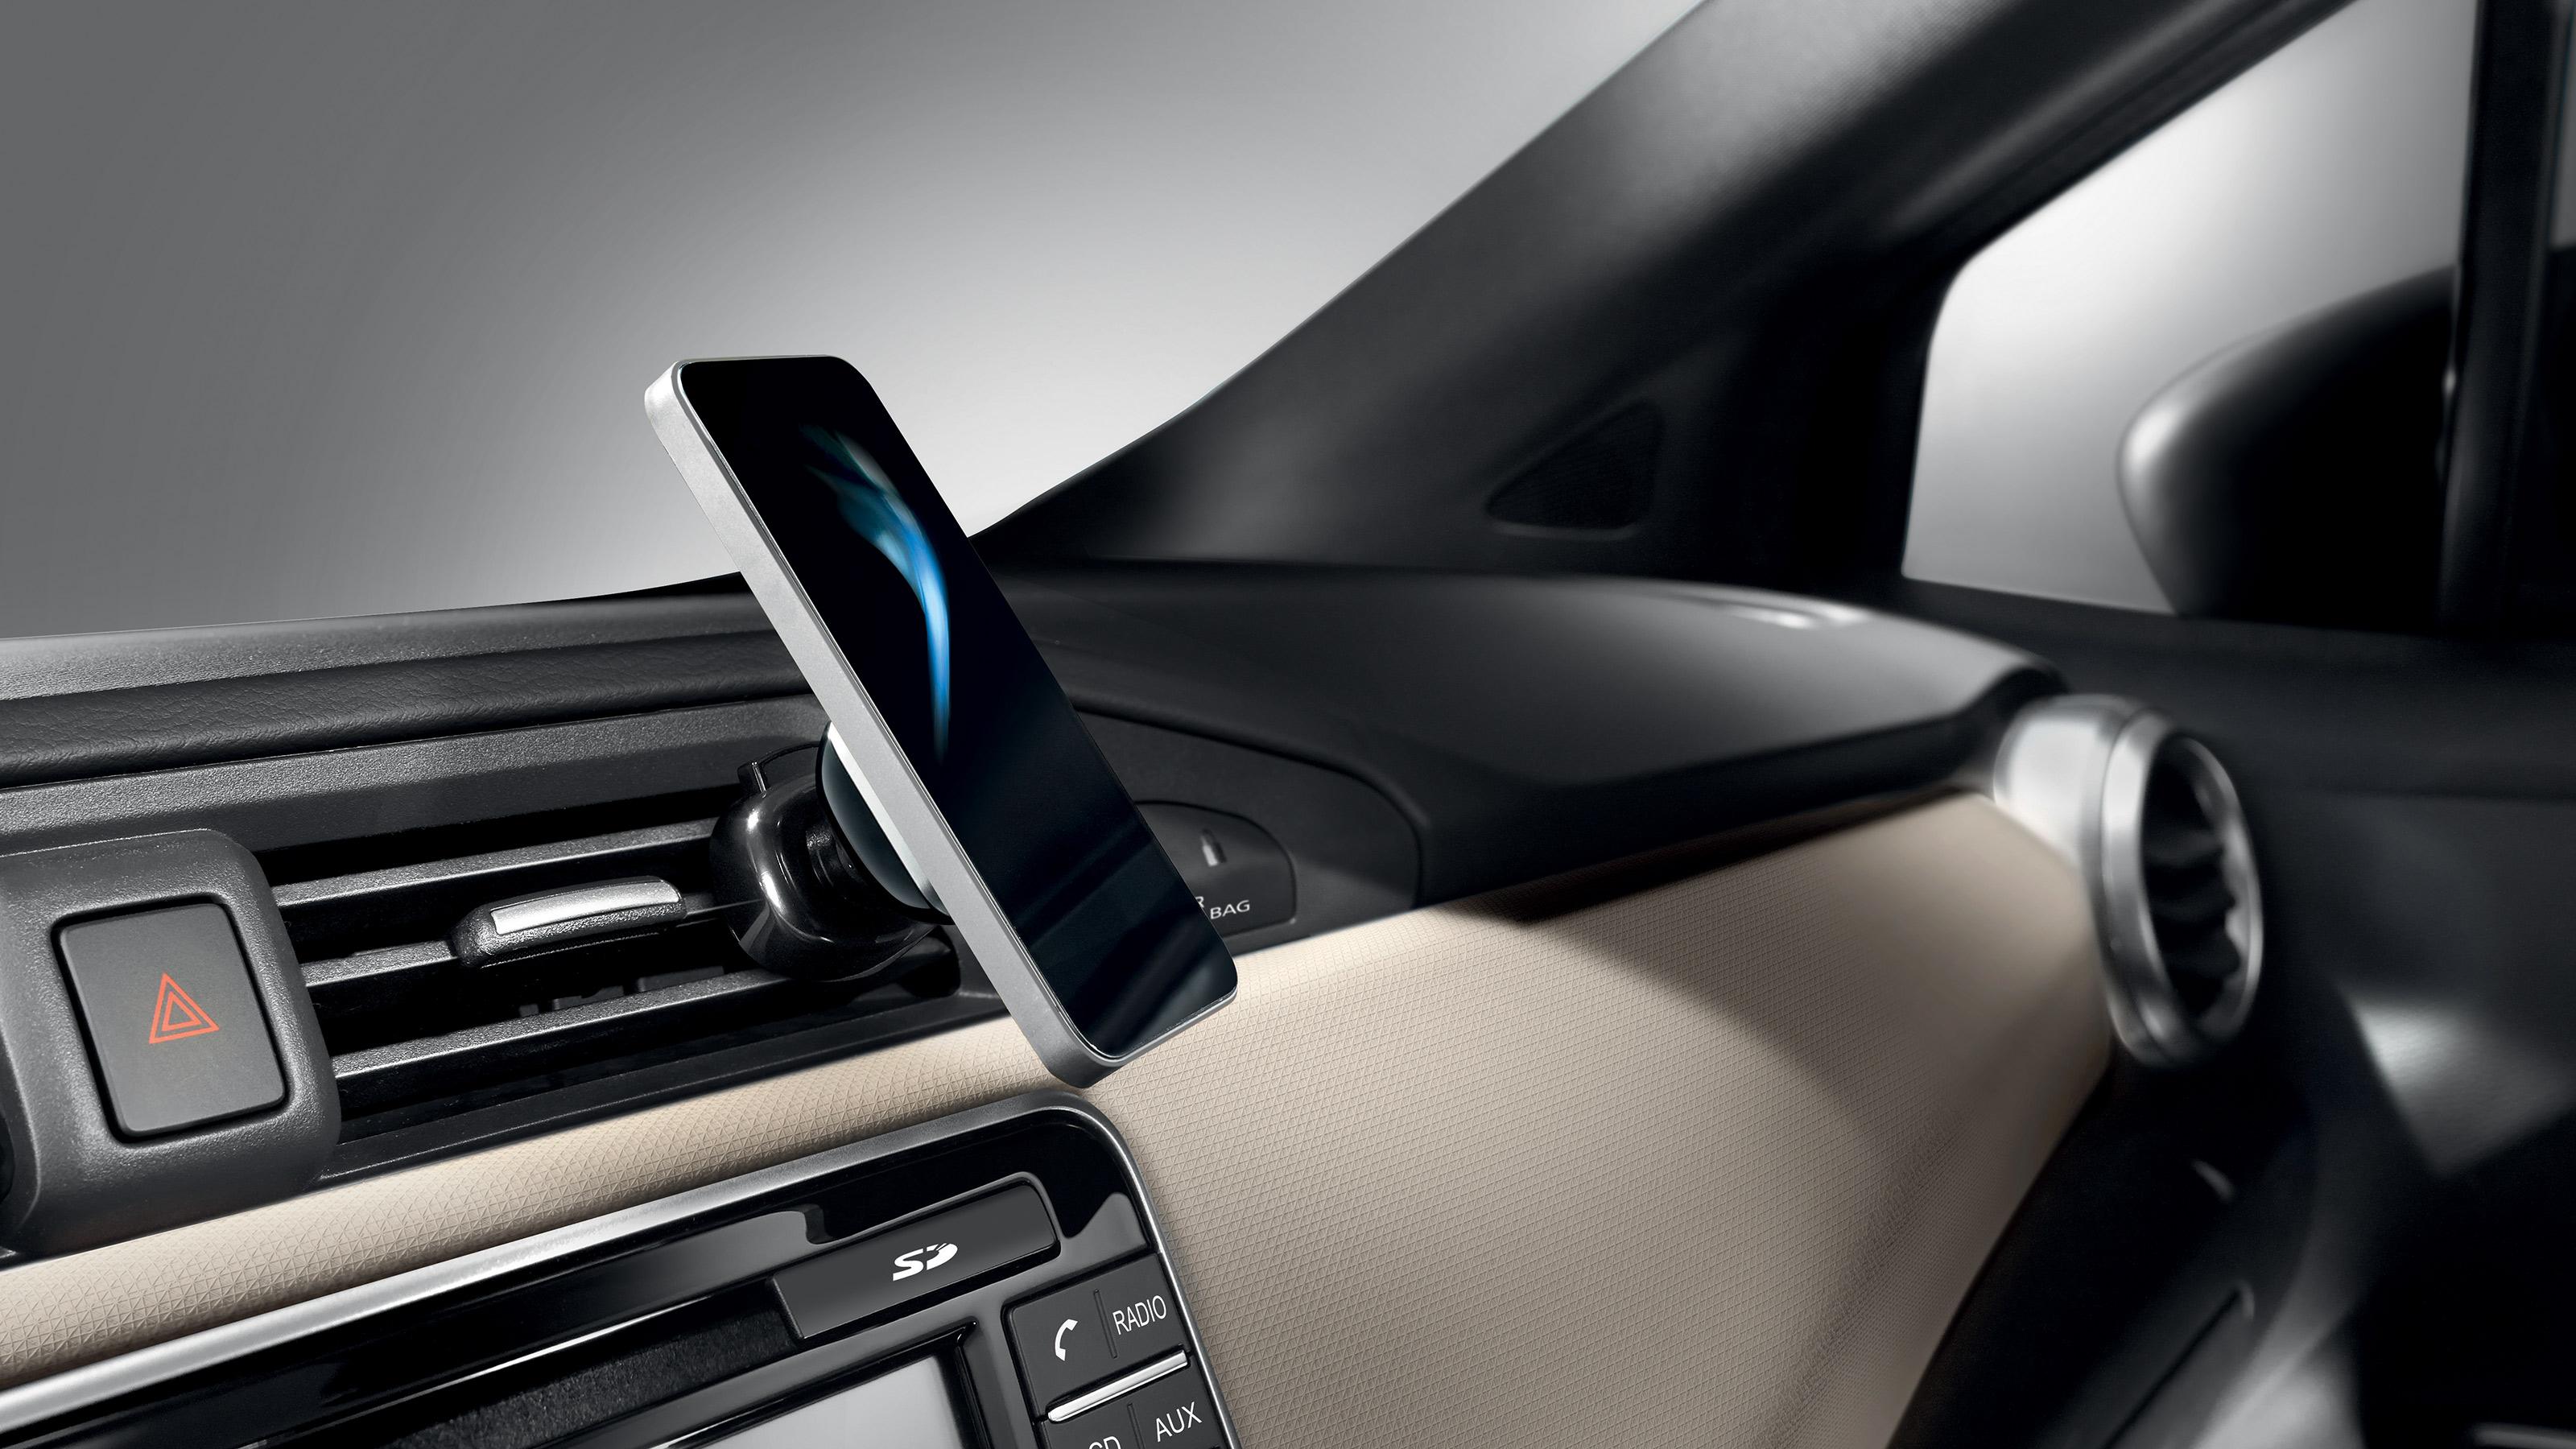 Nissan Micra Air Vent Mount Smartphone Holder